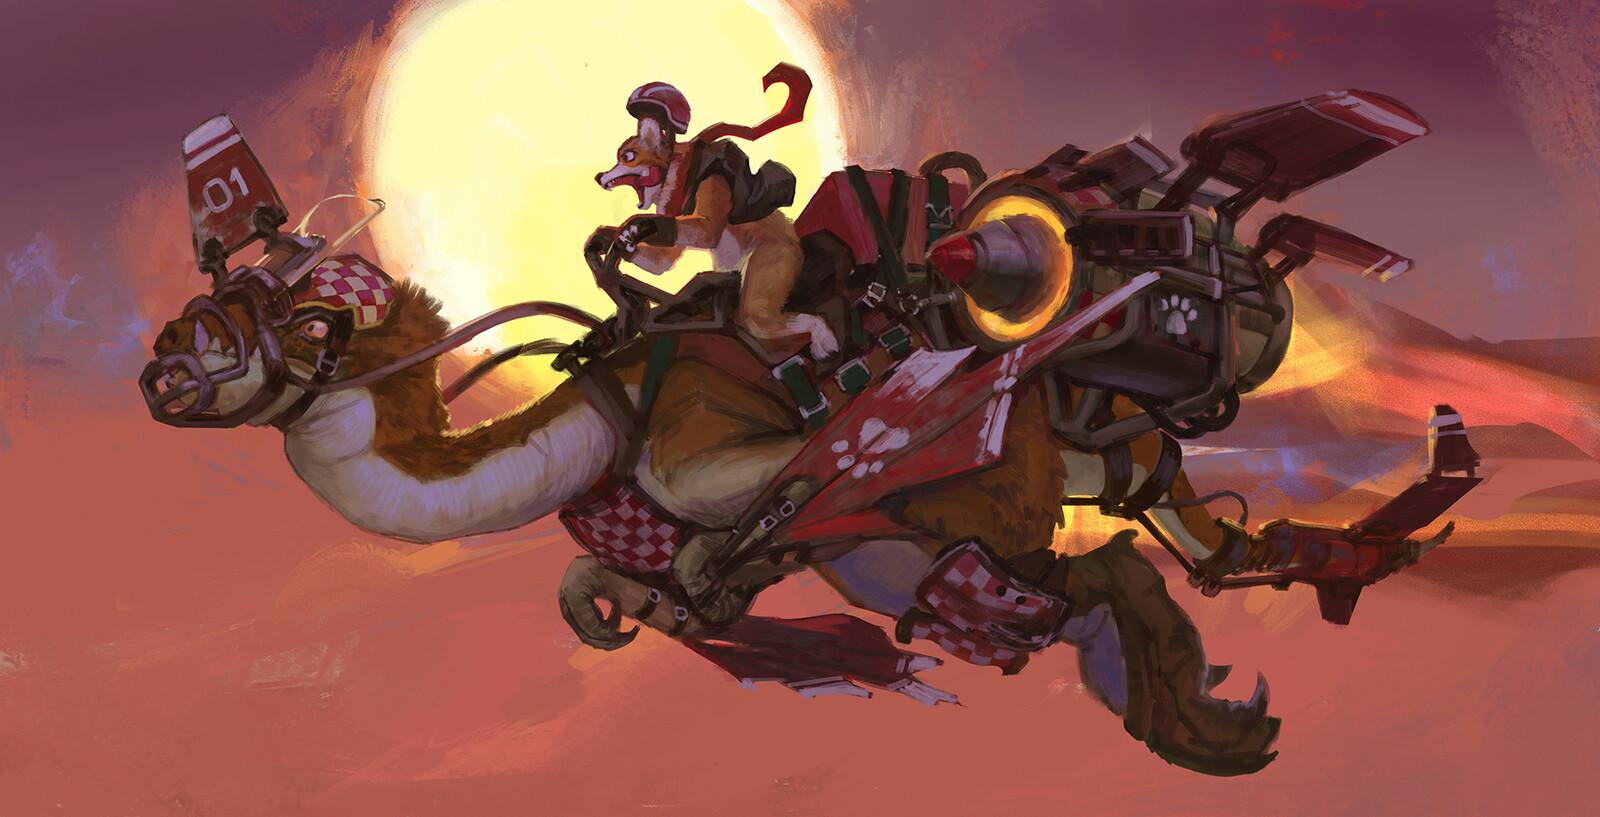 CDC - Dino racer